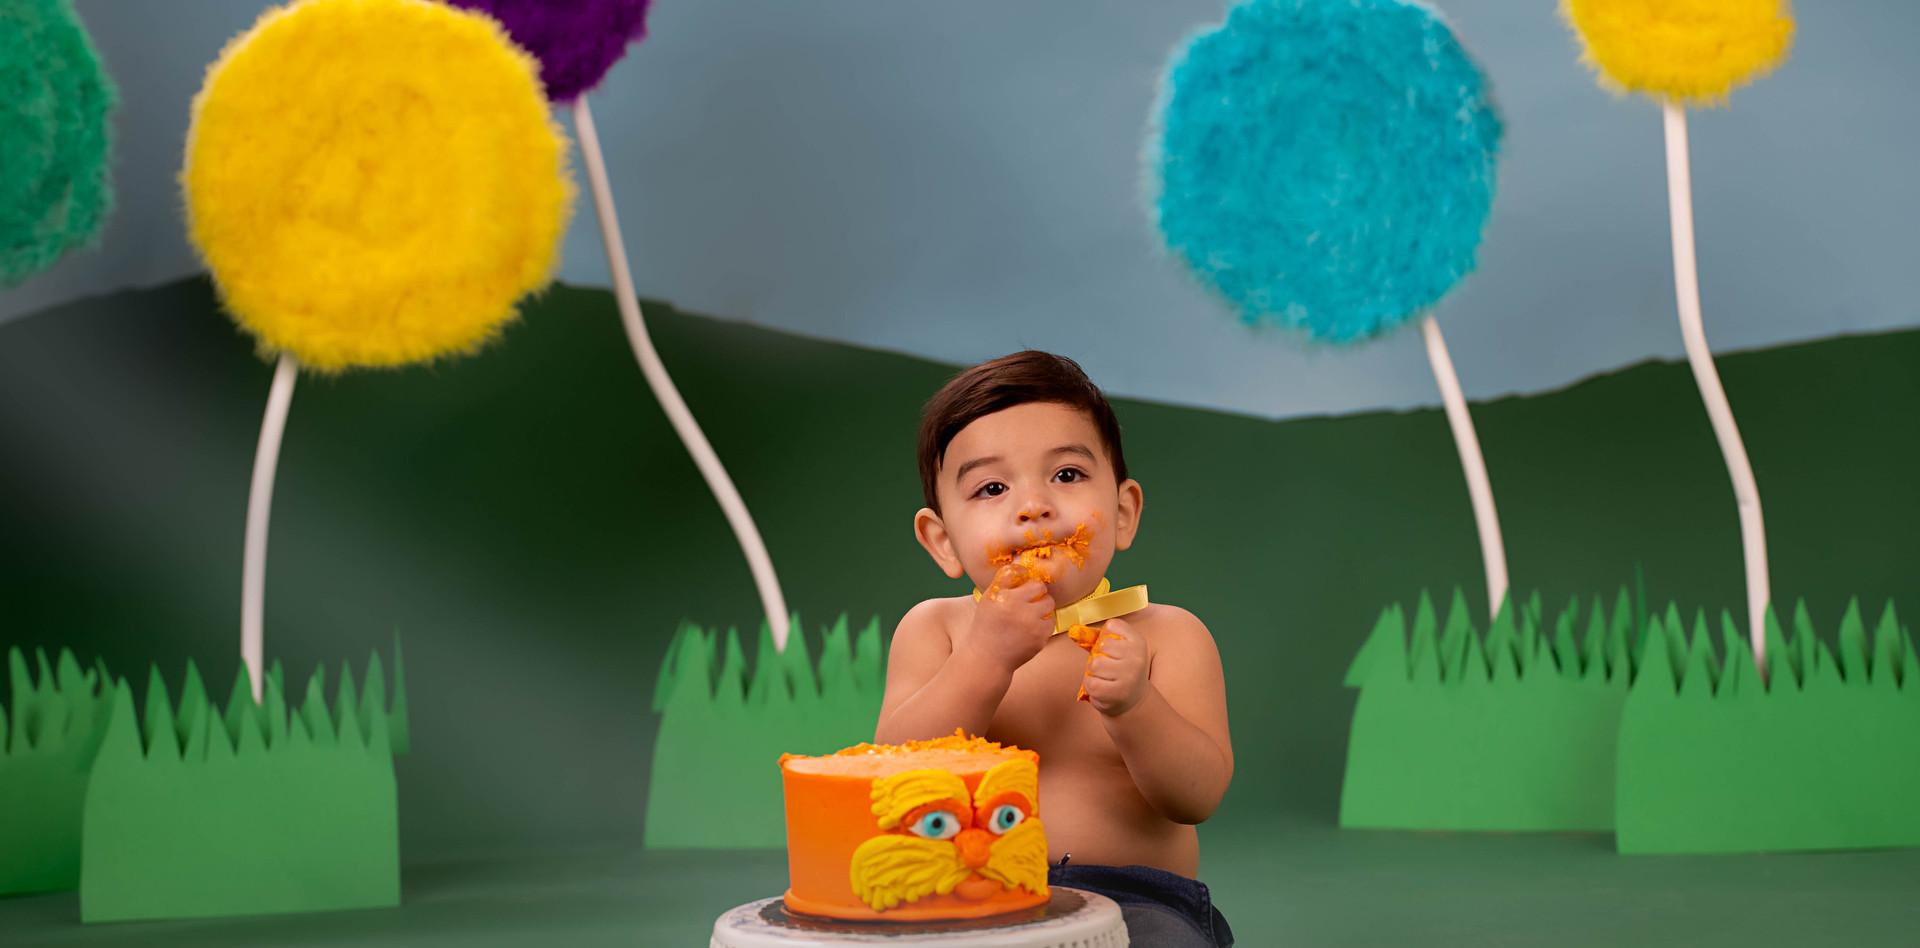 Dr Seuss The Lorax Smash Cake photo session